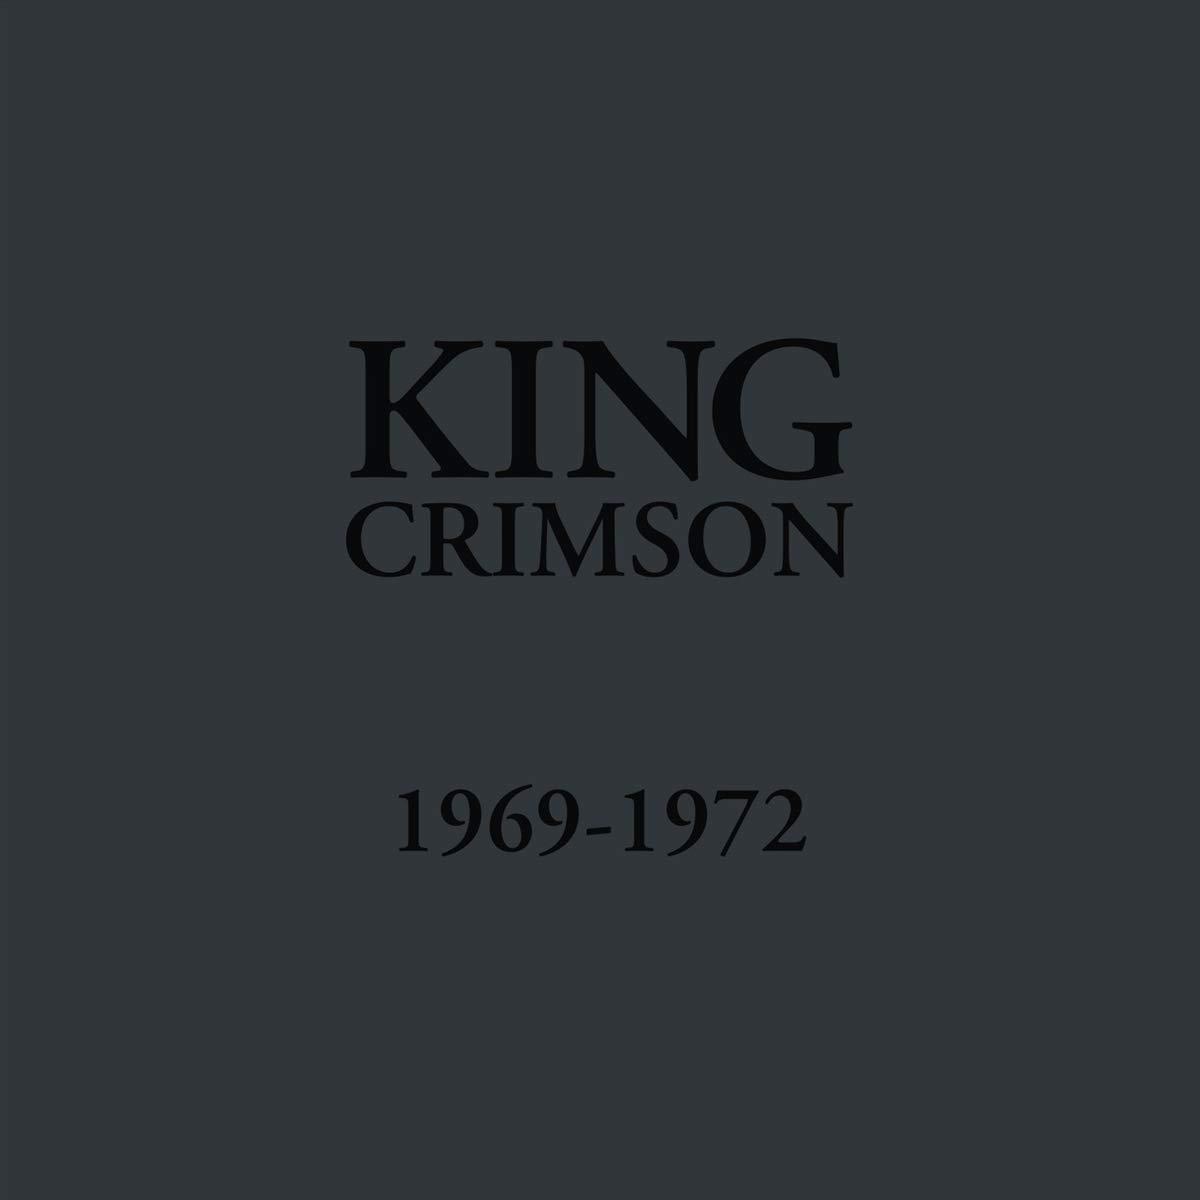 King Crimson - 1969 - 1972